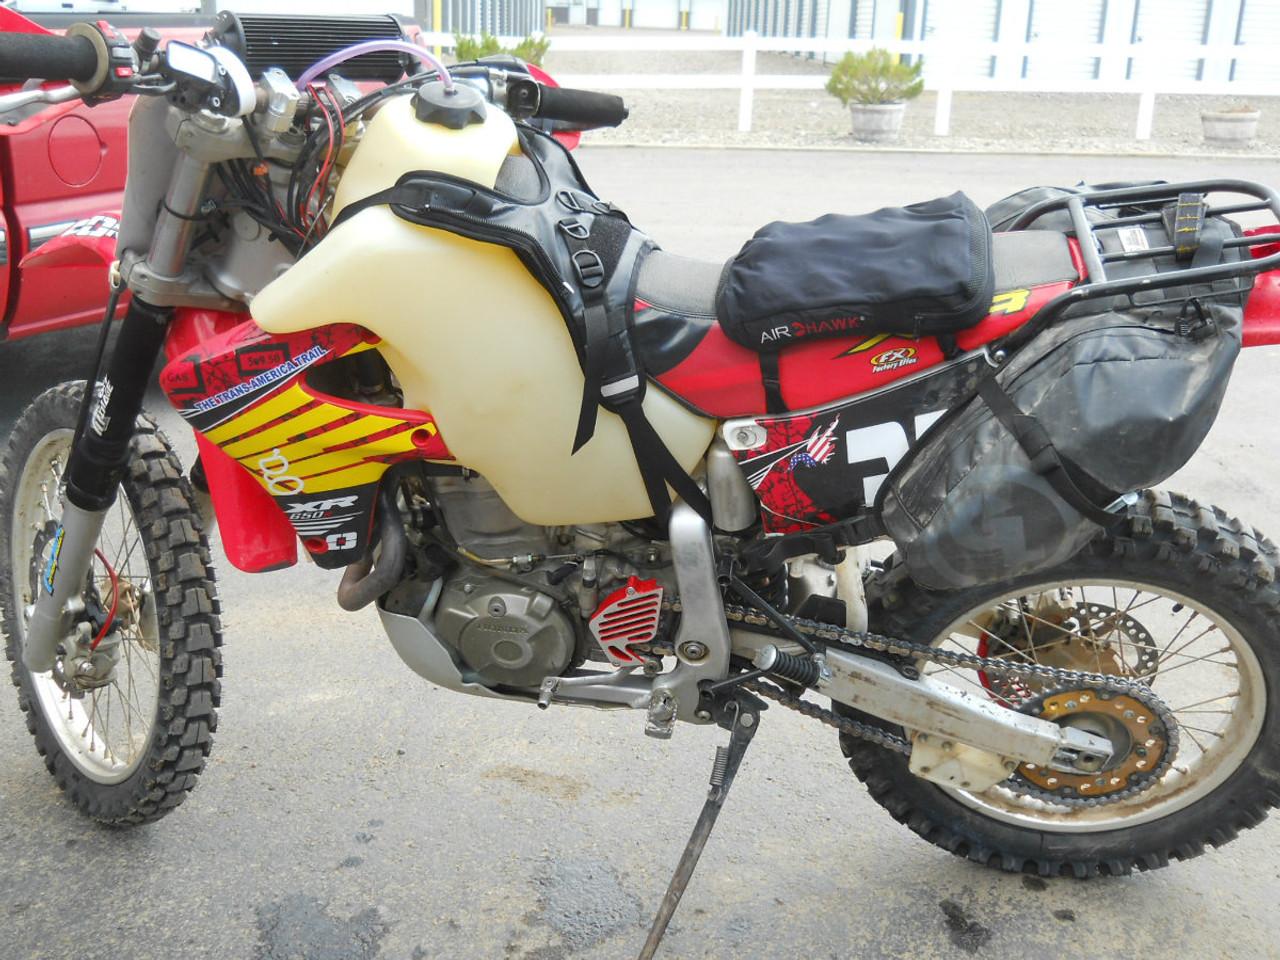 Topar Racing CaseSaver Countershaft Guard for 2000-2006 HONDA XR650R